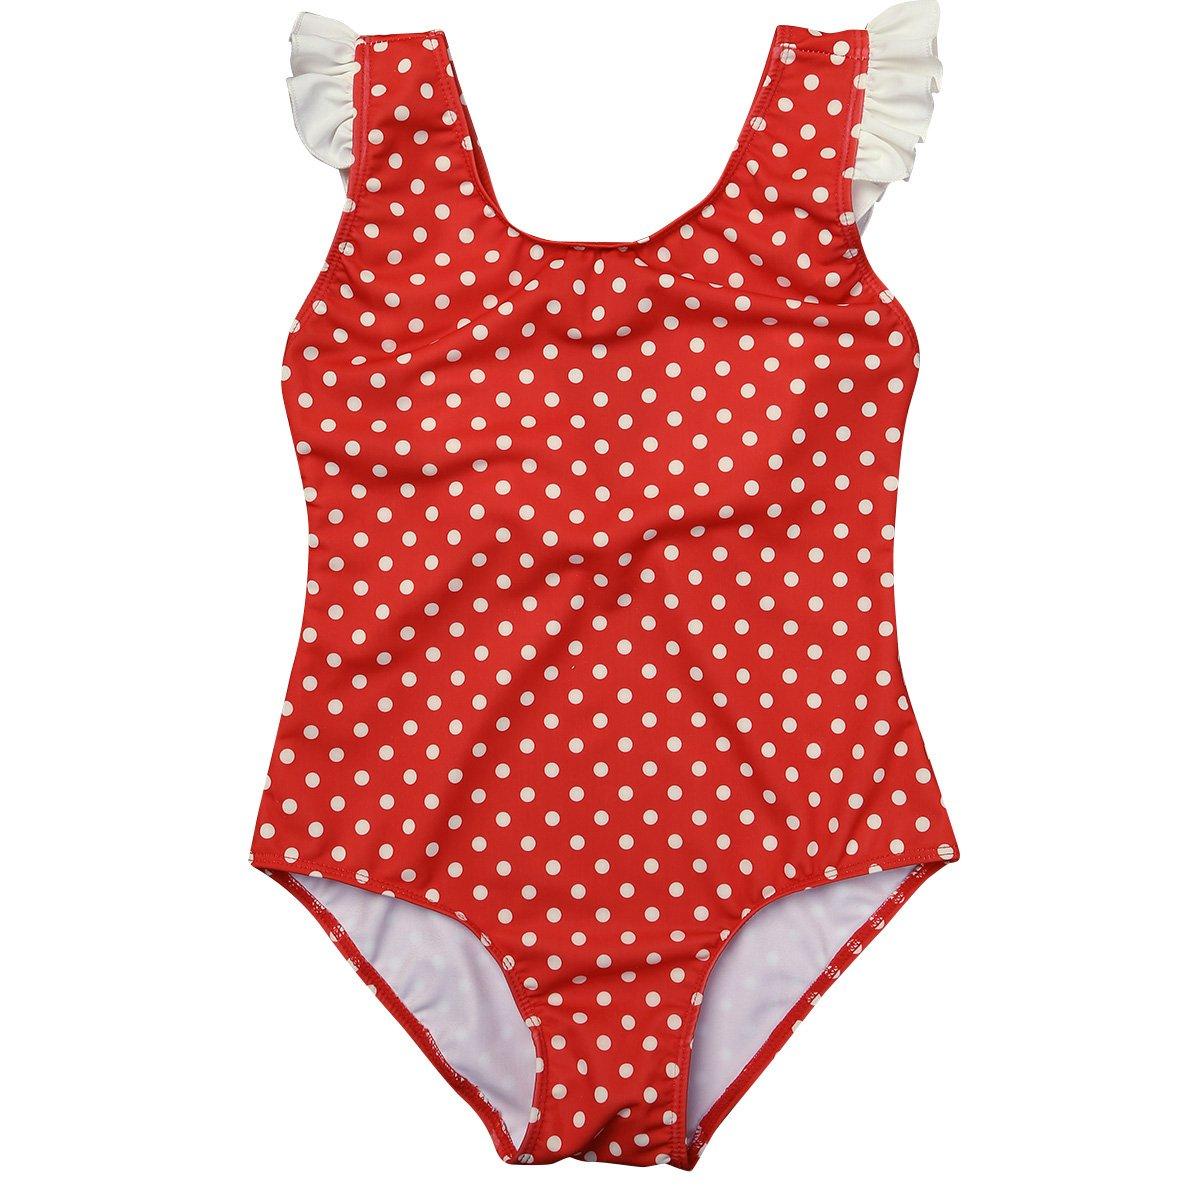 MSemis Little Baby Girls Retro Polka Dot Ruffles V Back One-Piece Swimsuit Swimwear Summer Beachwear